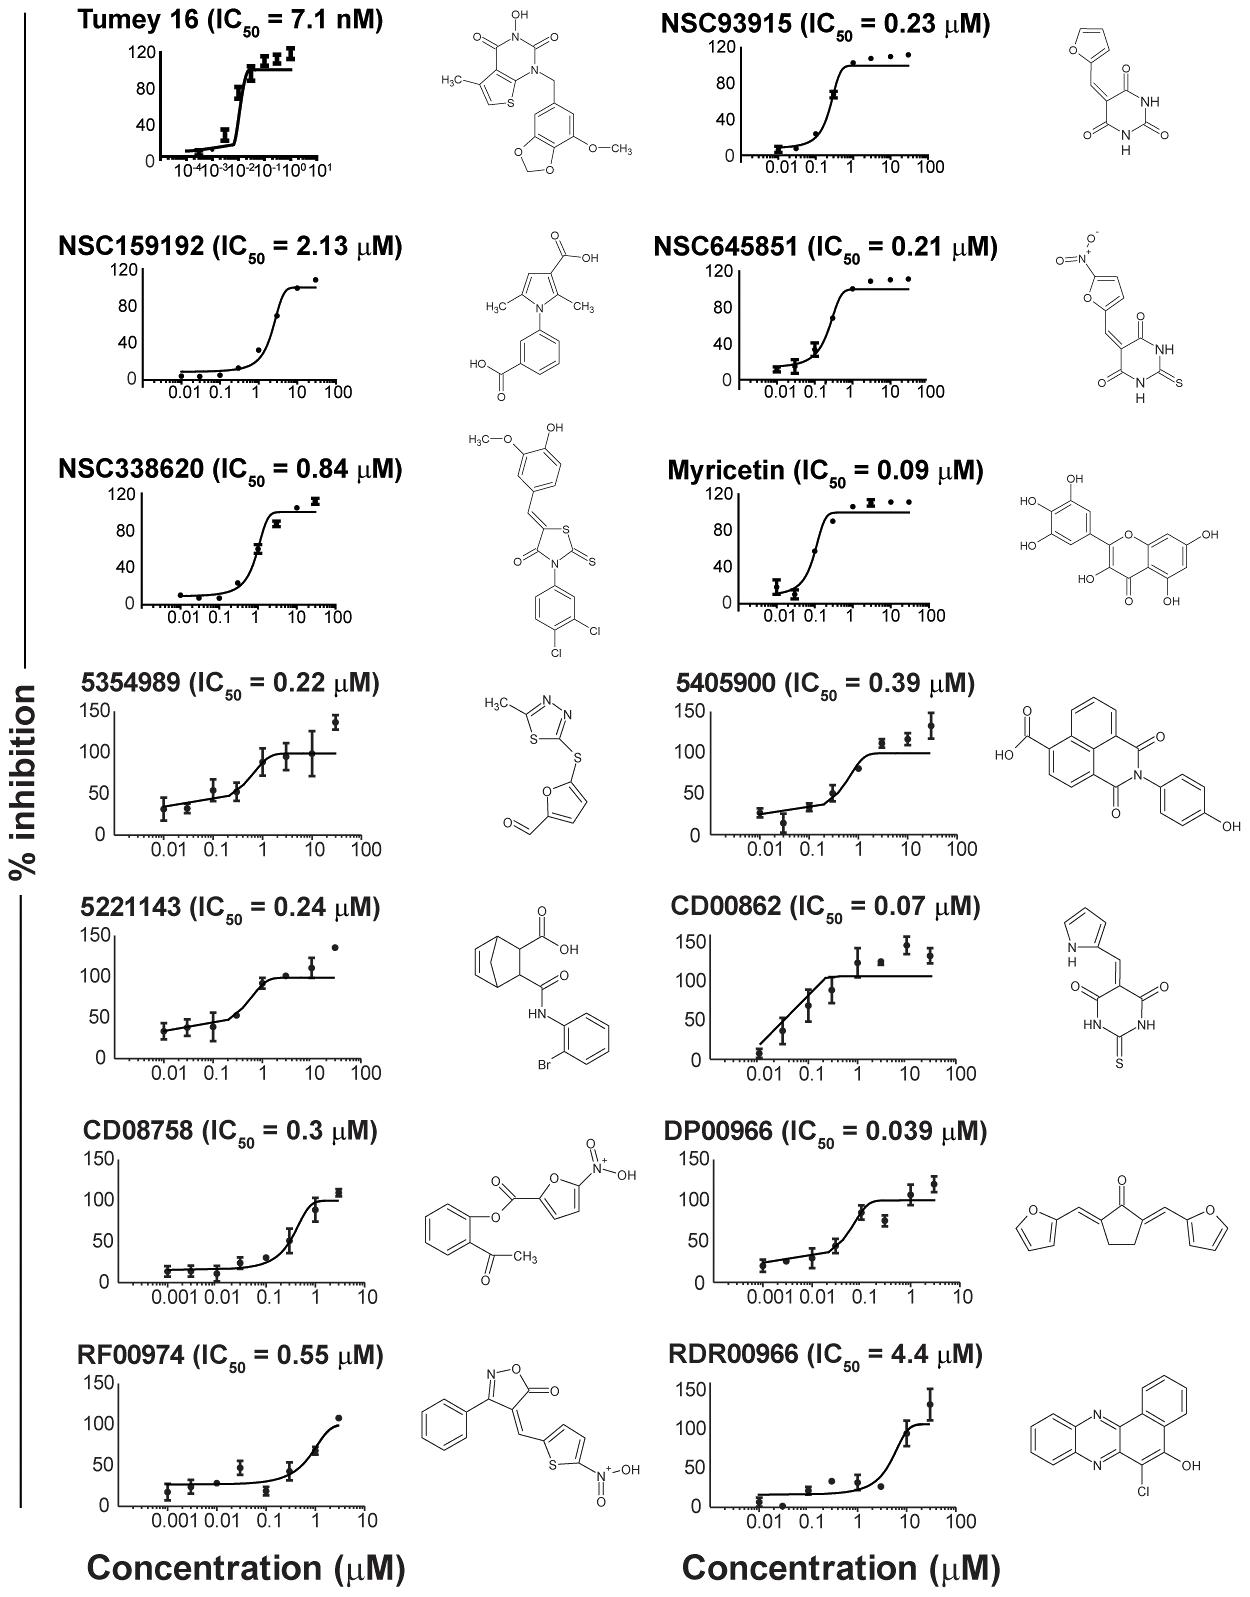 IC<sub>50</sub> curves of flap endonuclease inhibitors.